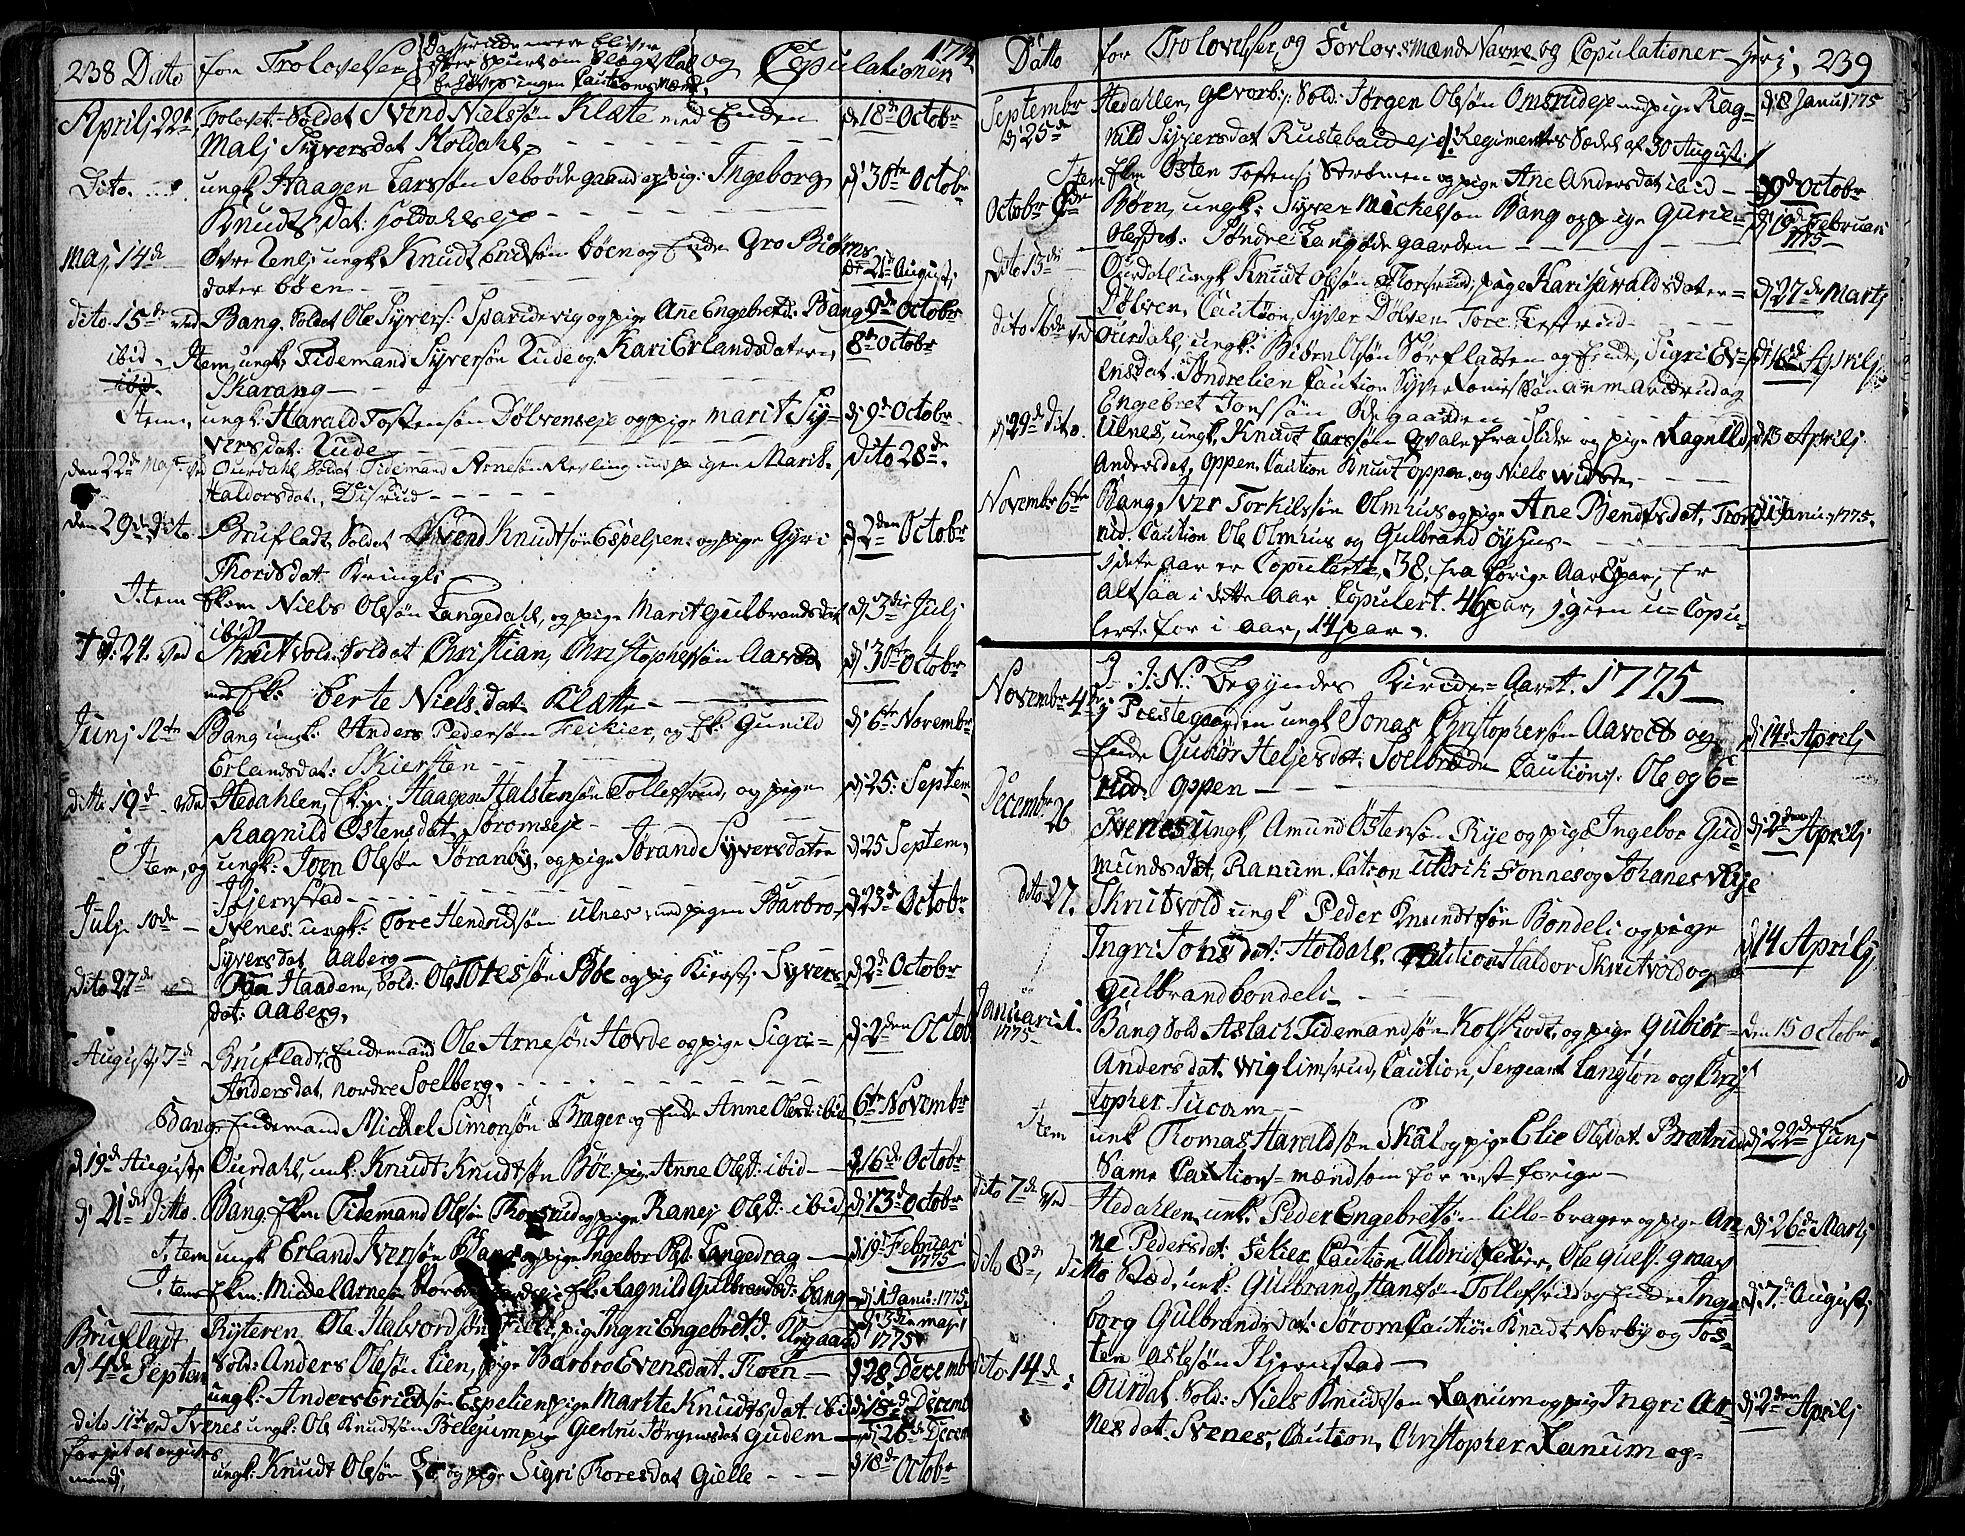 SAH, Aurdal prestekontor, Ministerialbok nr. 5, 1763-1781, s. 238-239